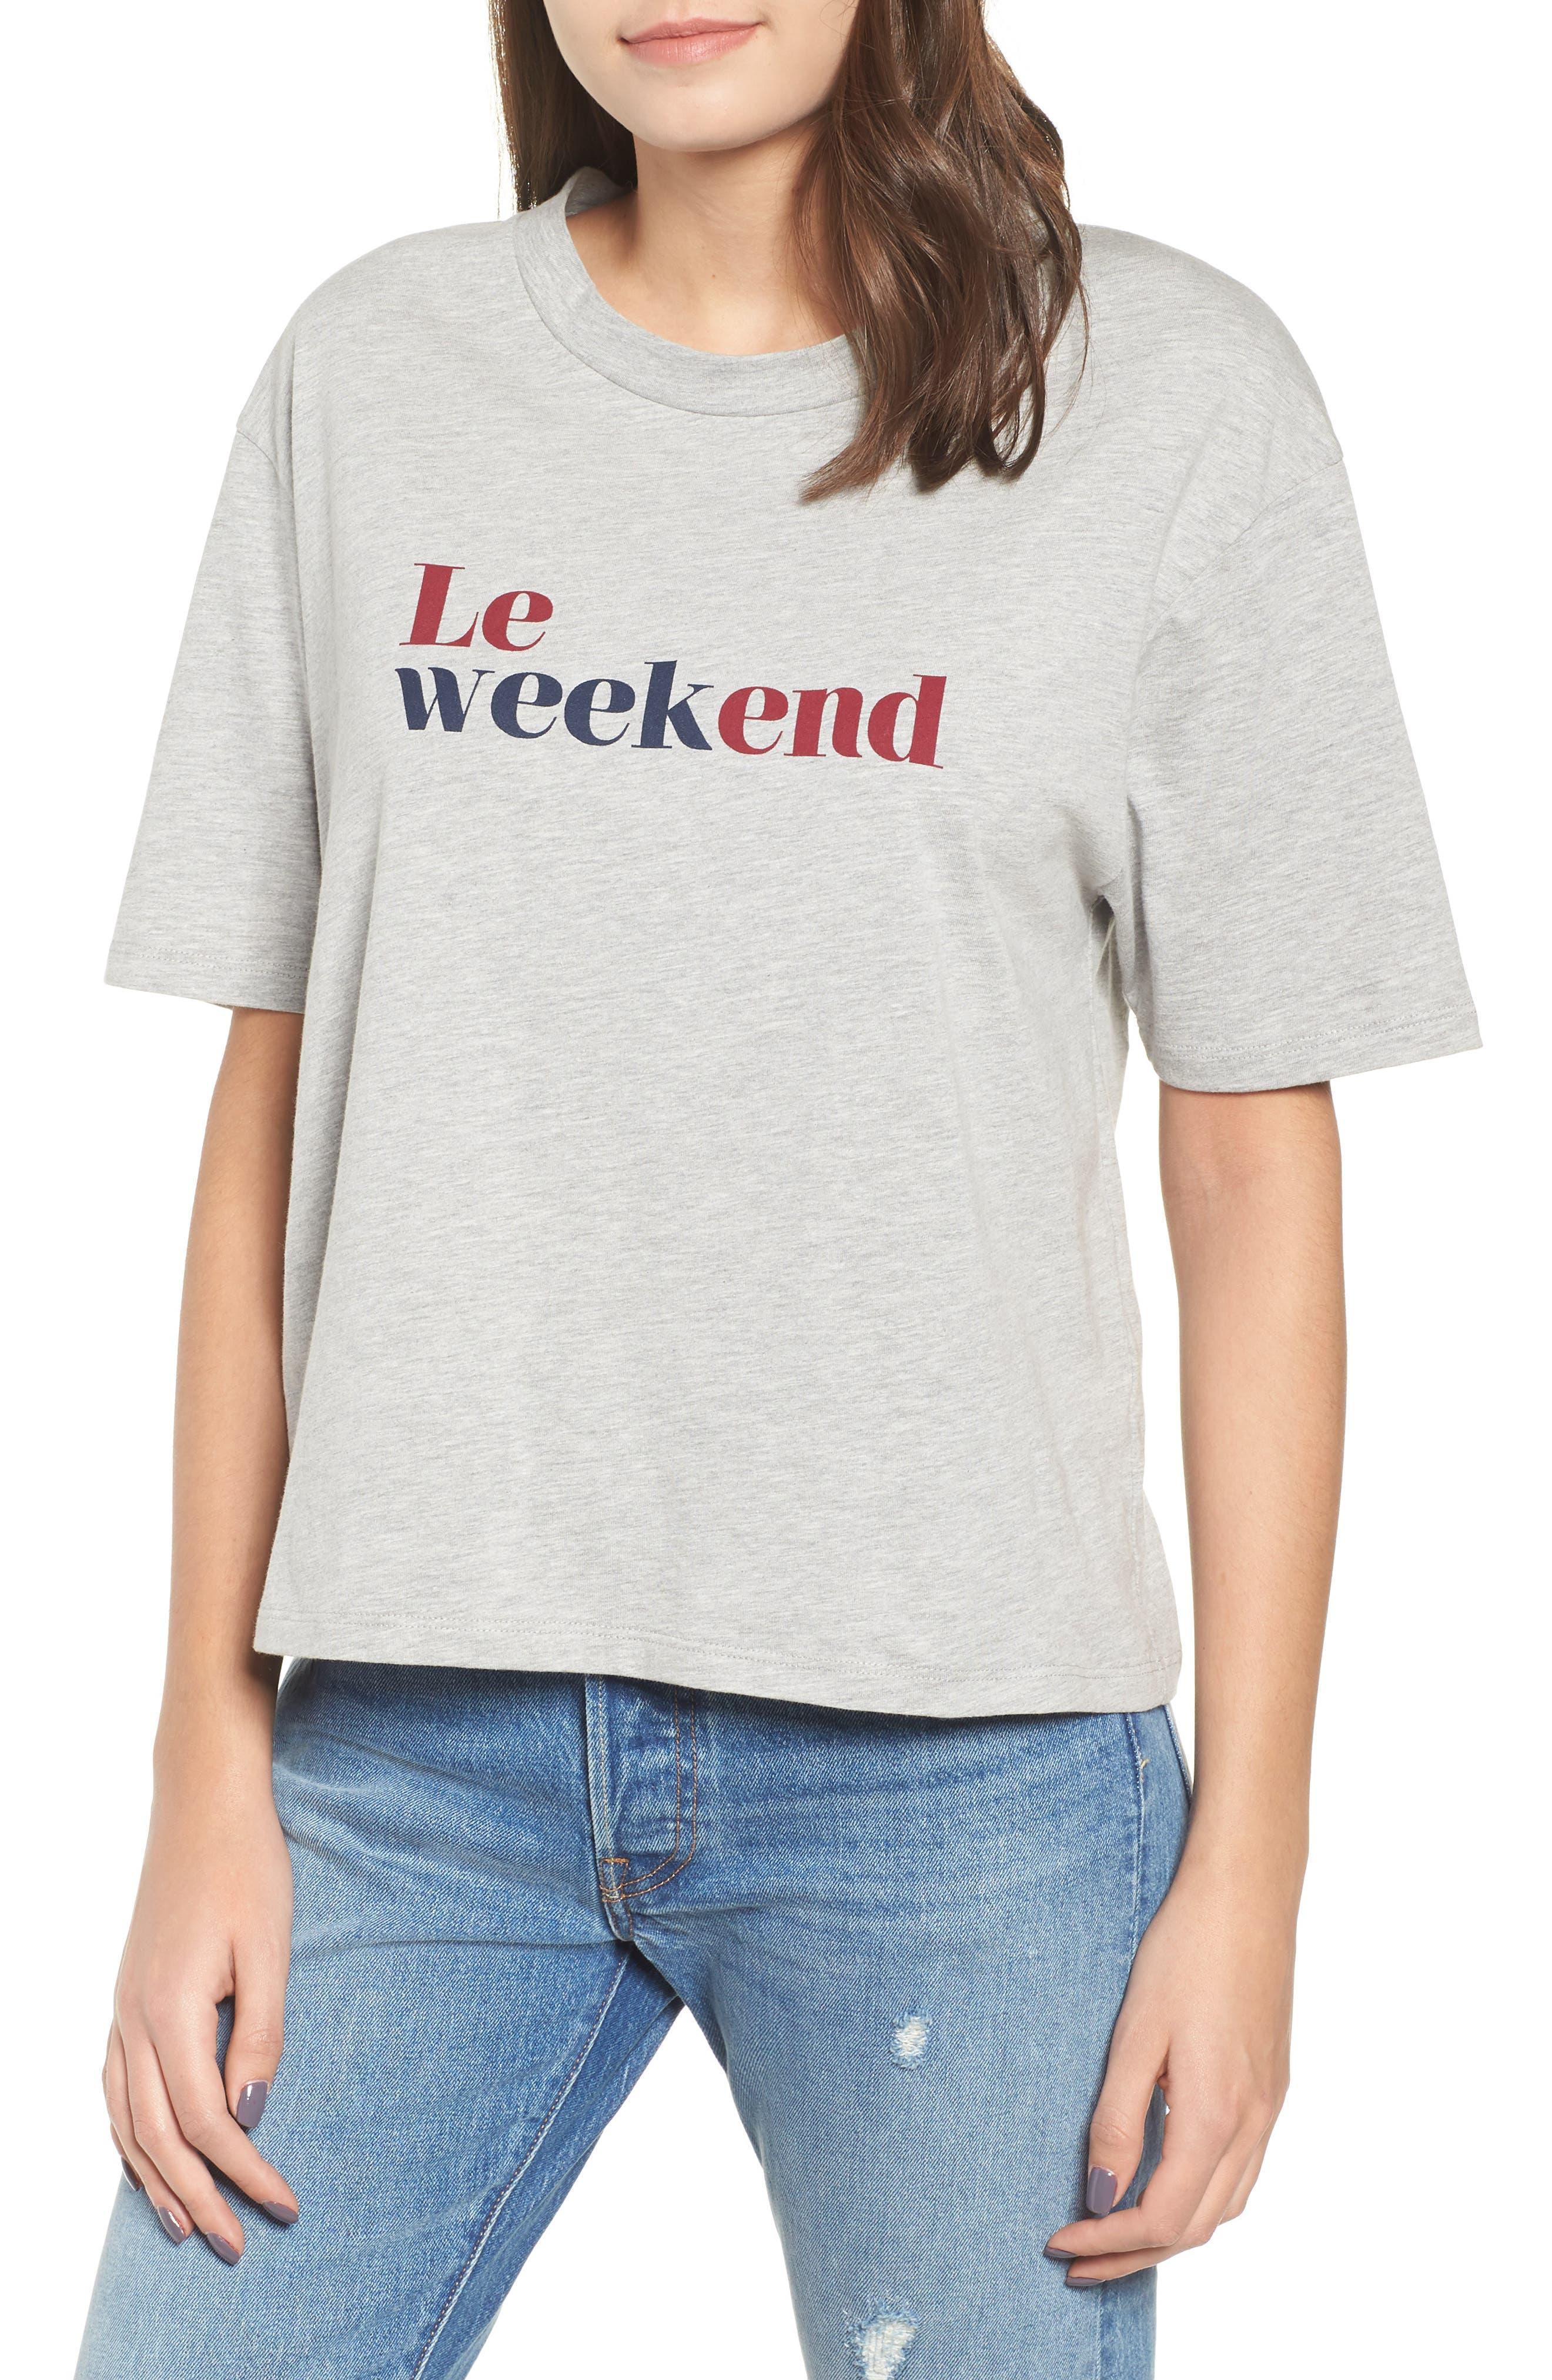 Le Weekend Tee,                         Main,                         color, 020